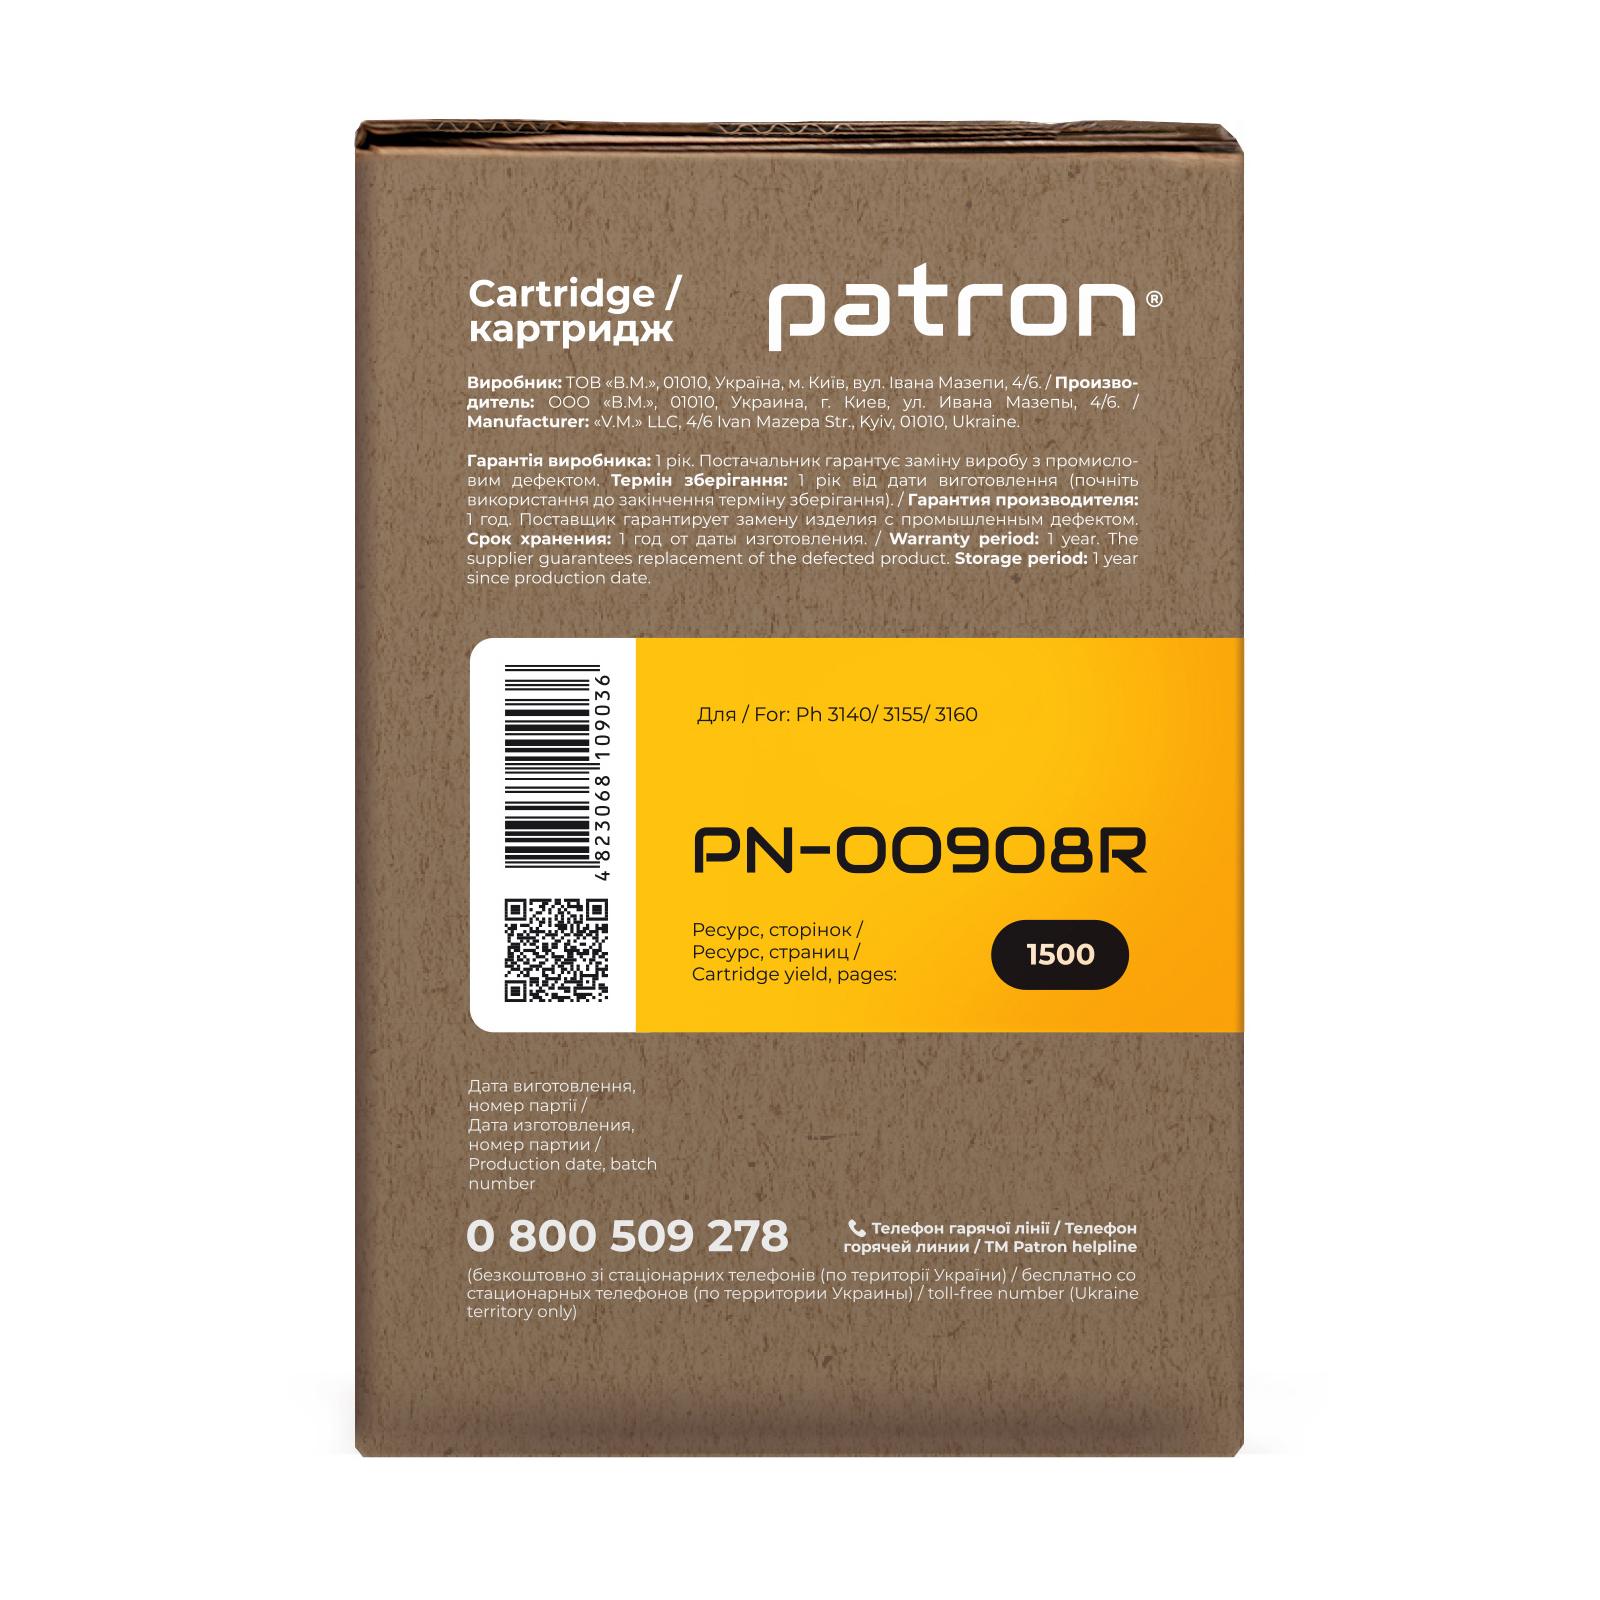 Картридж PATRON XEROX Ph 3140 (108R00908) Extra (PN-00908R) изображение 3